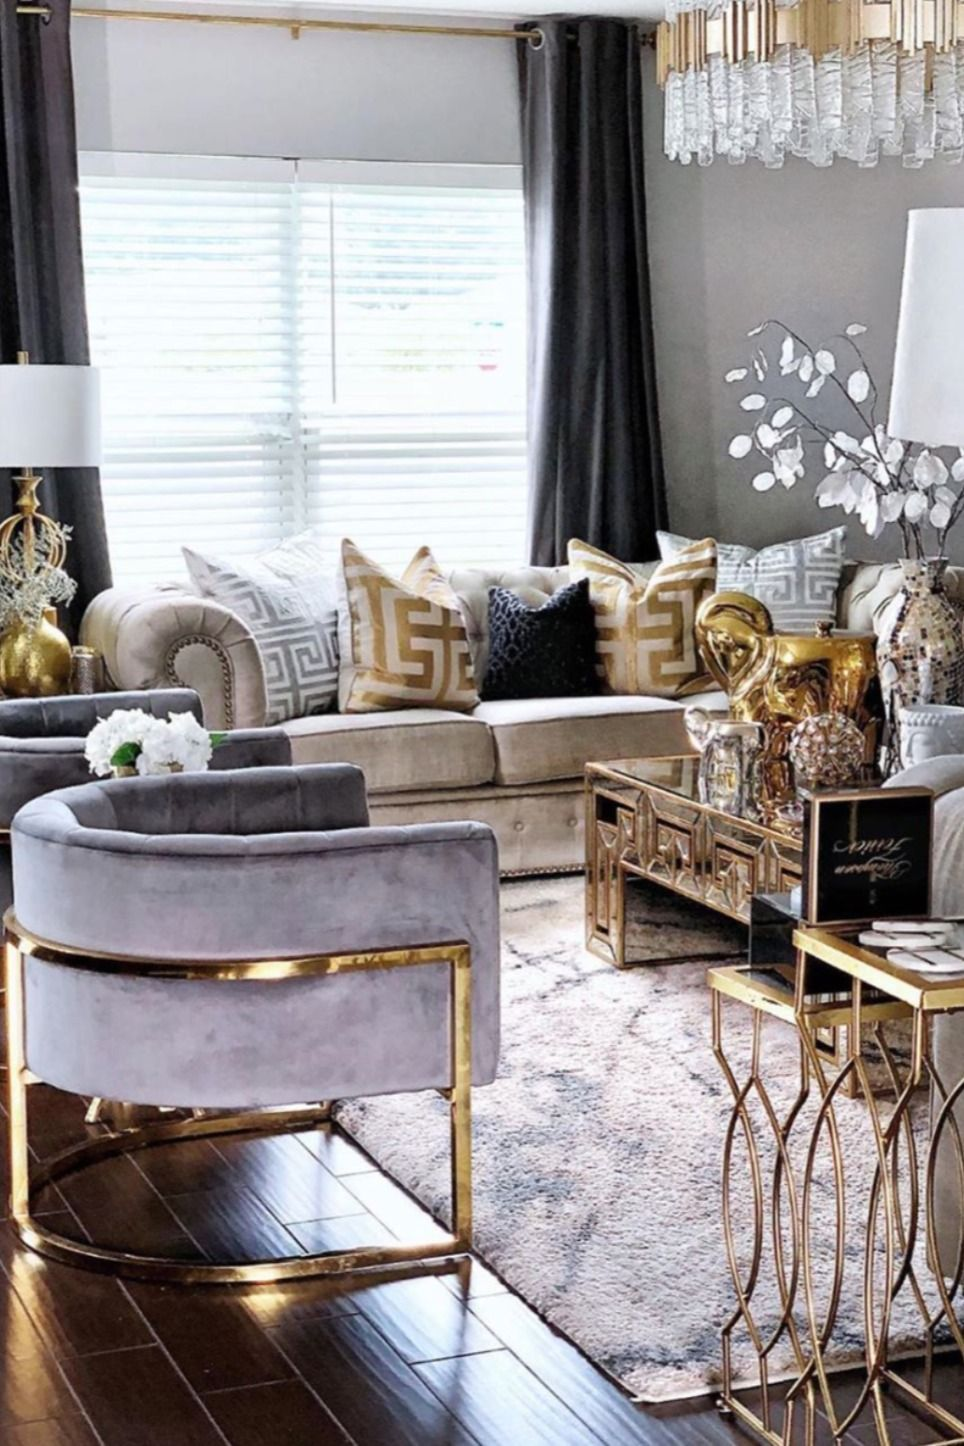 Gold Grand Elephant Candle Living Room Decor Cozy Luxury Living Room Design Living Room Design Decor